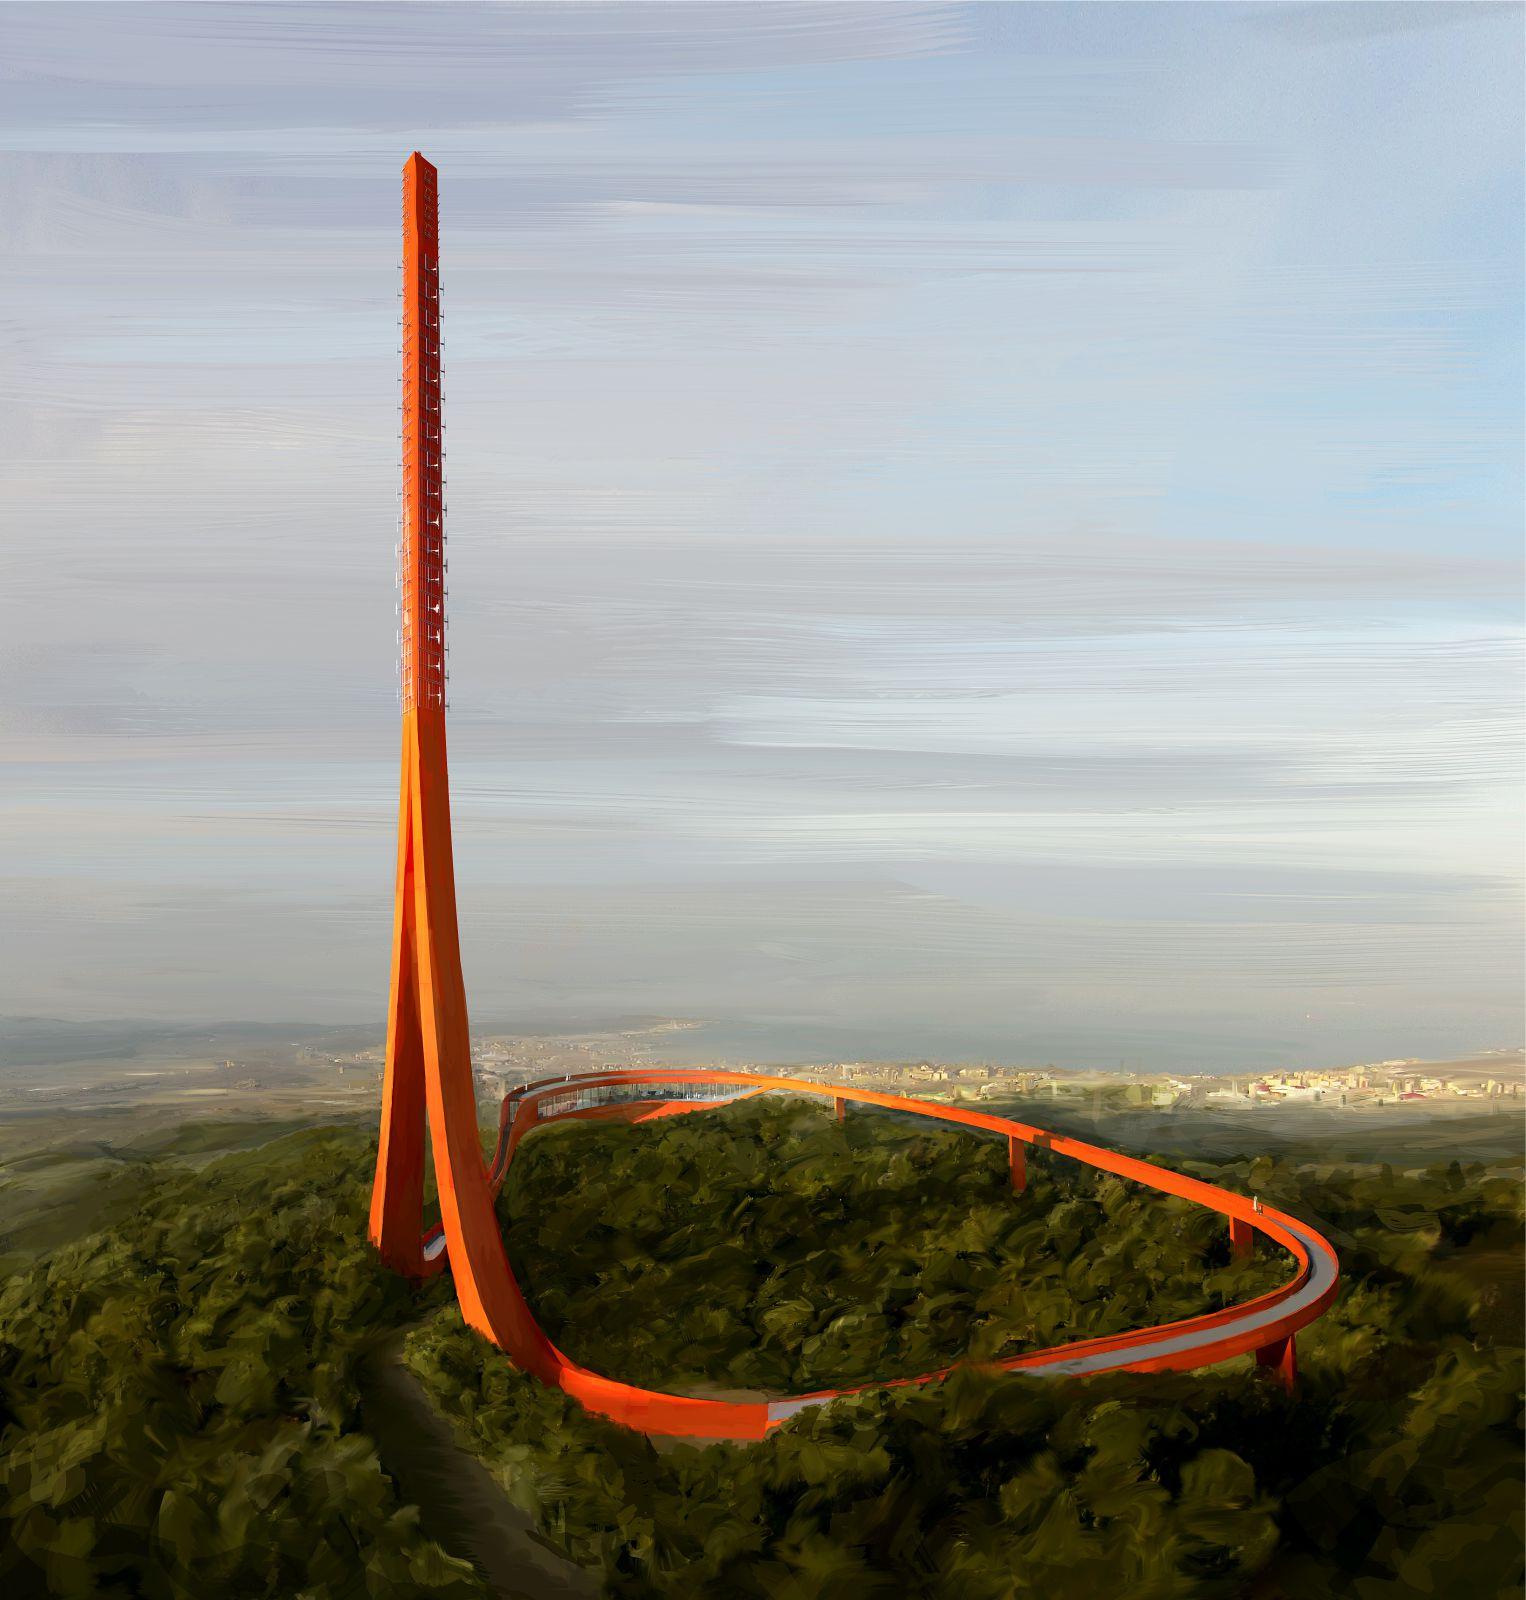 Çanakkale Antenna Tower